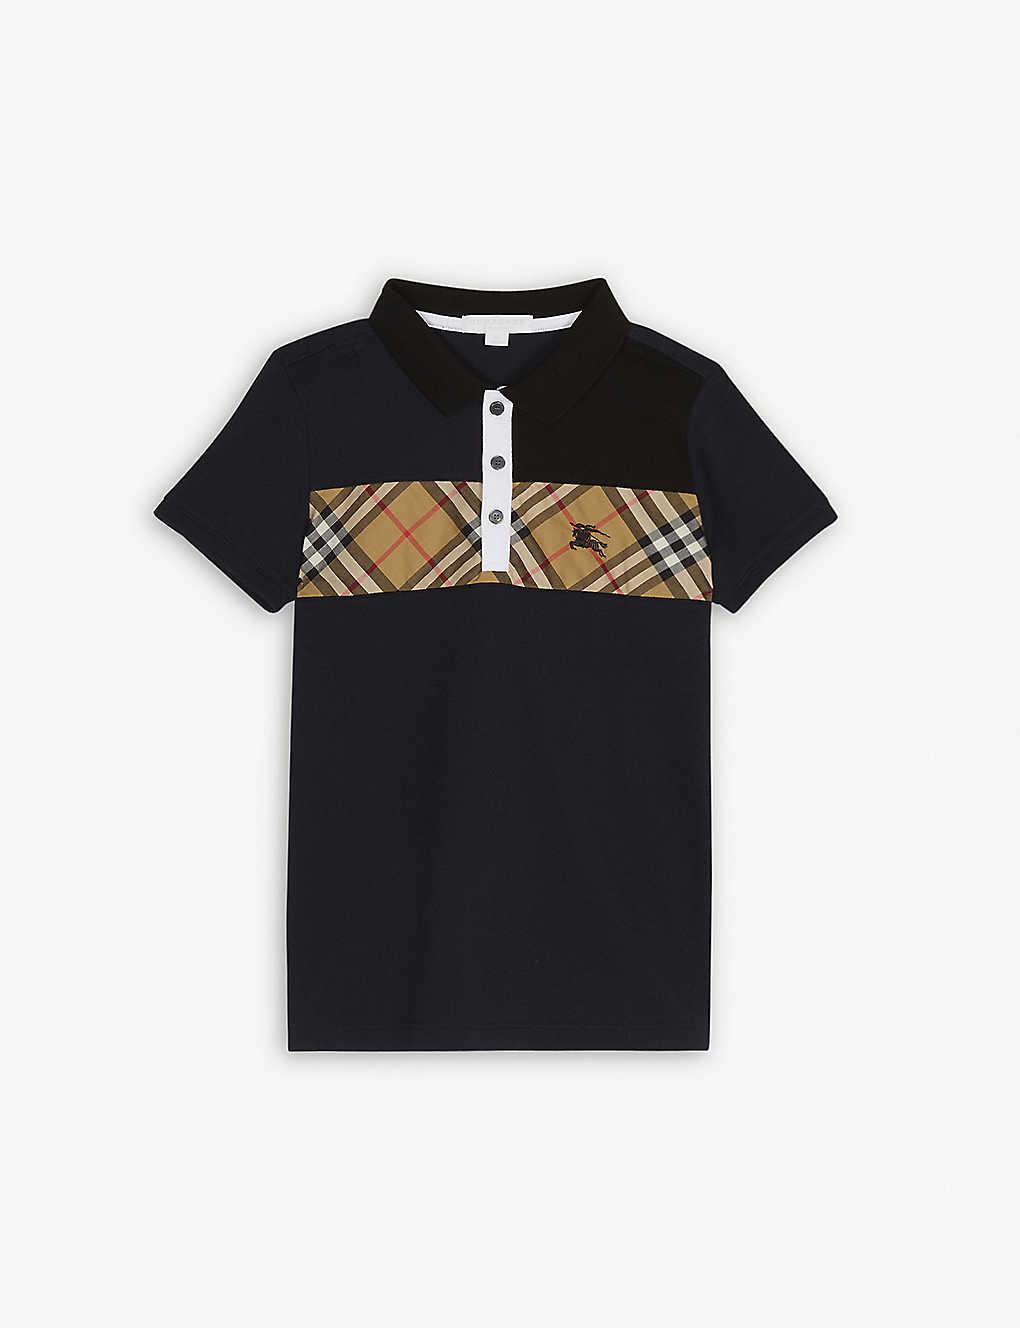 788d8cd49 BURBERRY - Check print cotton polo shirt 4-14 years